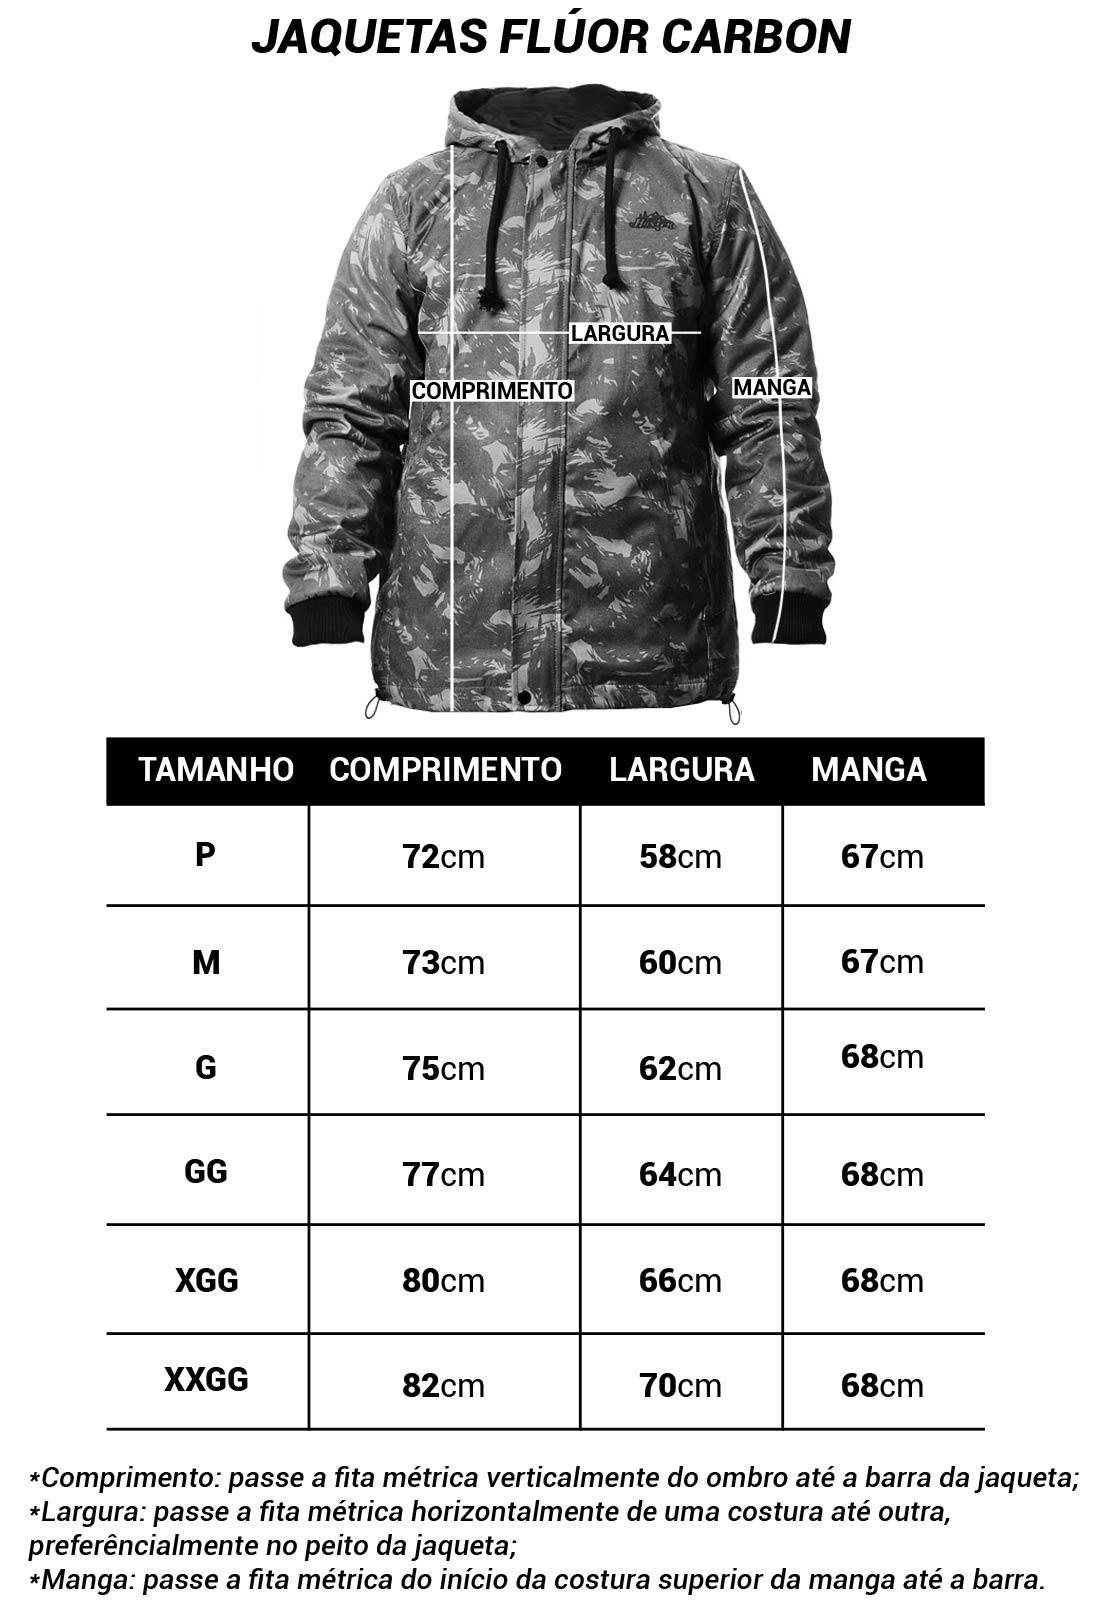 JAQUETA CAMUFLADA PALHADA FLÚOR CARBON MASCULINA  - REAL HUNTER OUTDOORS